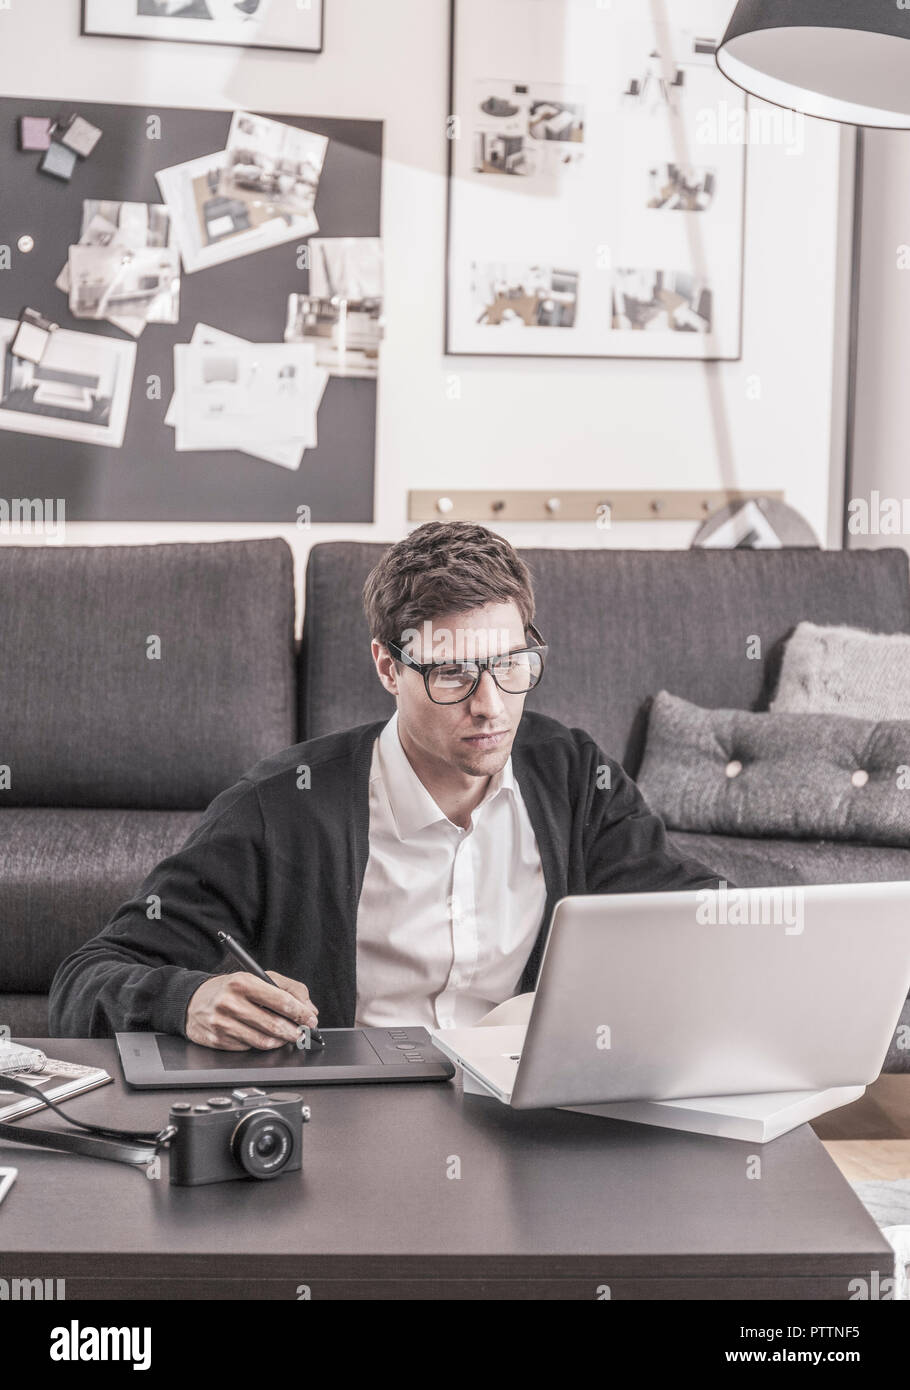 Mann zuhause, arbeitet am Laptop (model-released) Stock Photo